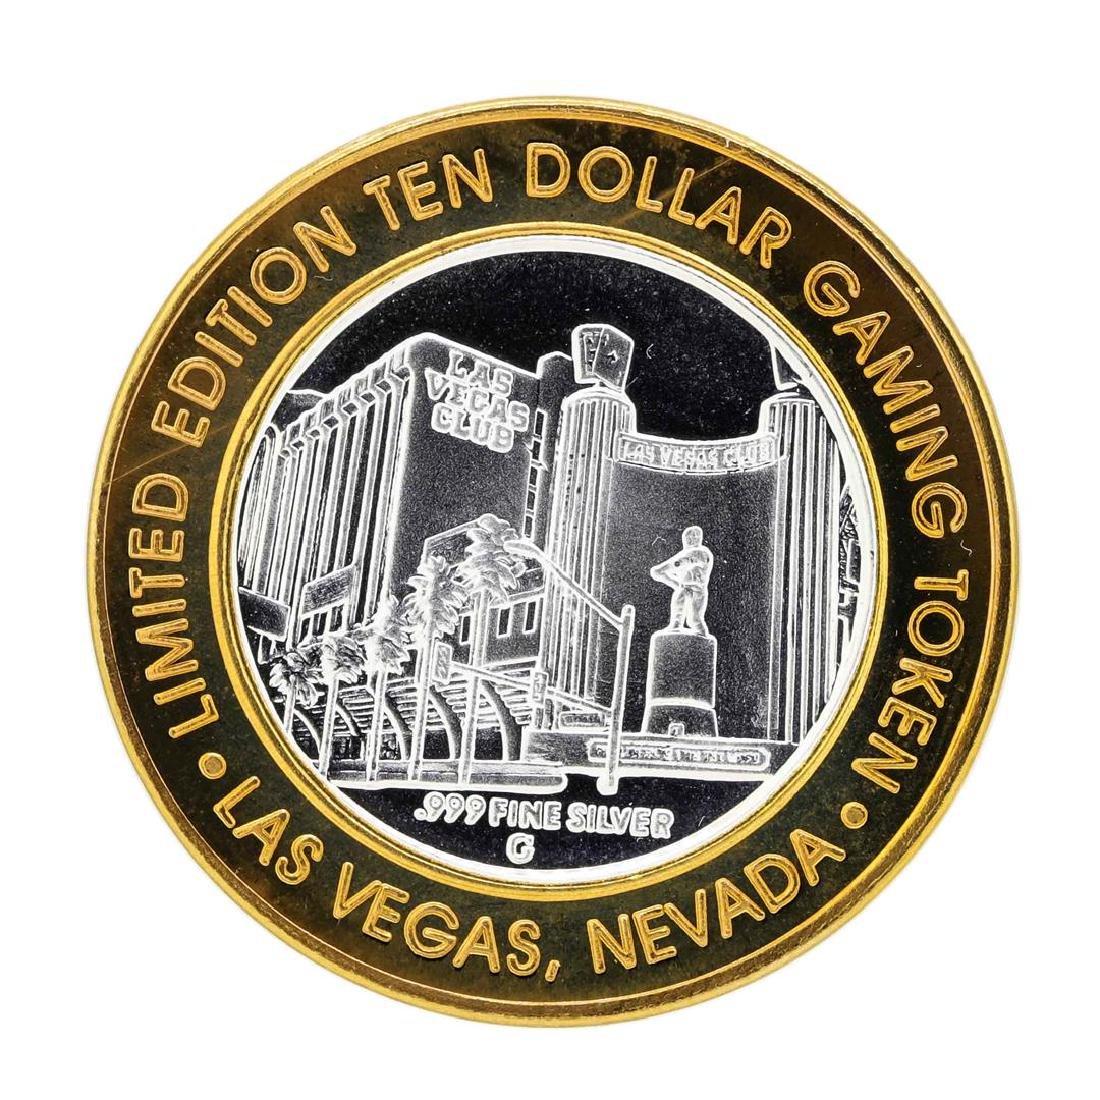 .999 Silver Las Vegas Club $10 Limited Edition Casino